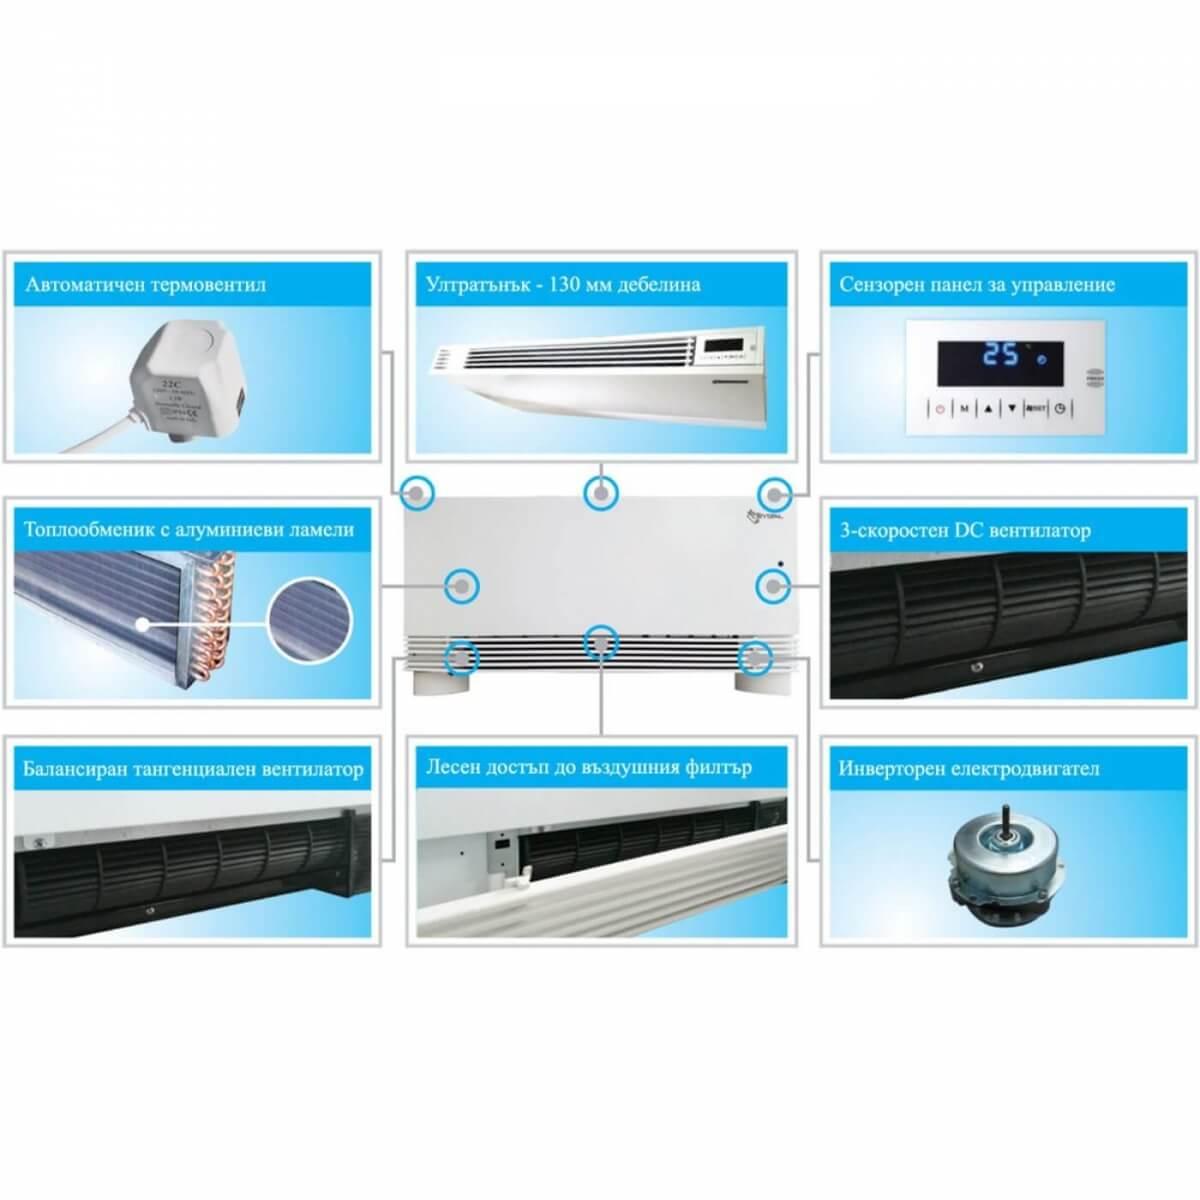 Вентилаторен конвектор Crystal BGR-800 L/R - 2